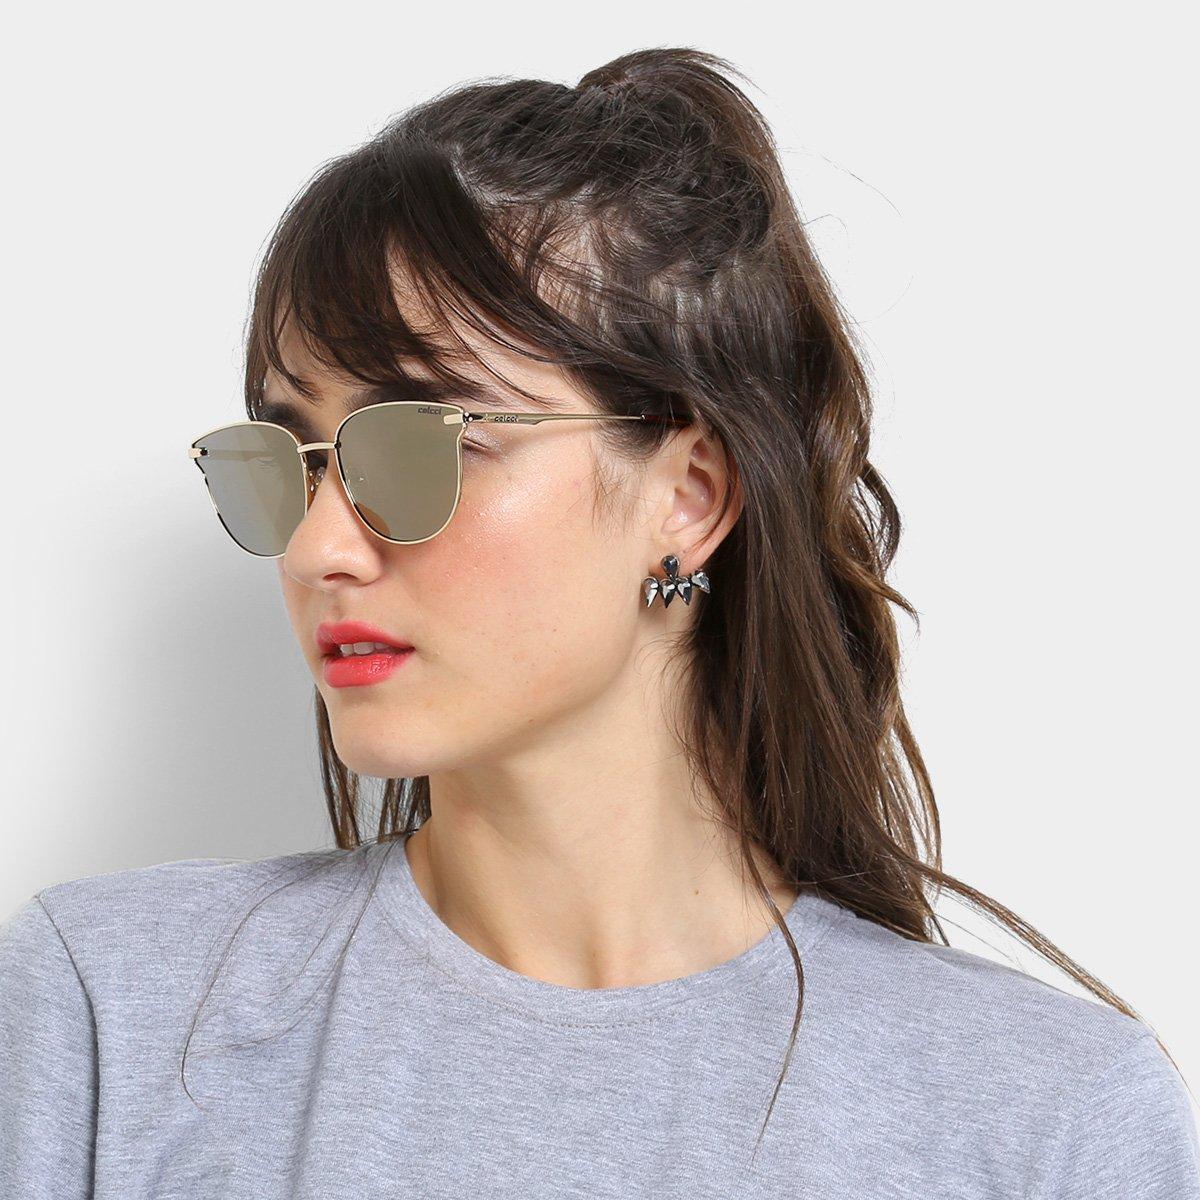 Óculos de Sol Colcci C0092 Feminino - Compre Agora   Zattini 2ac20cfad2